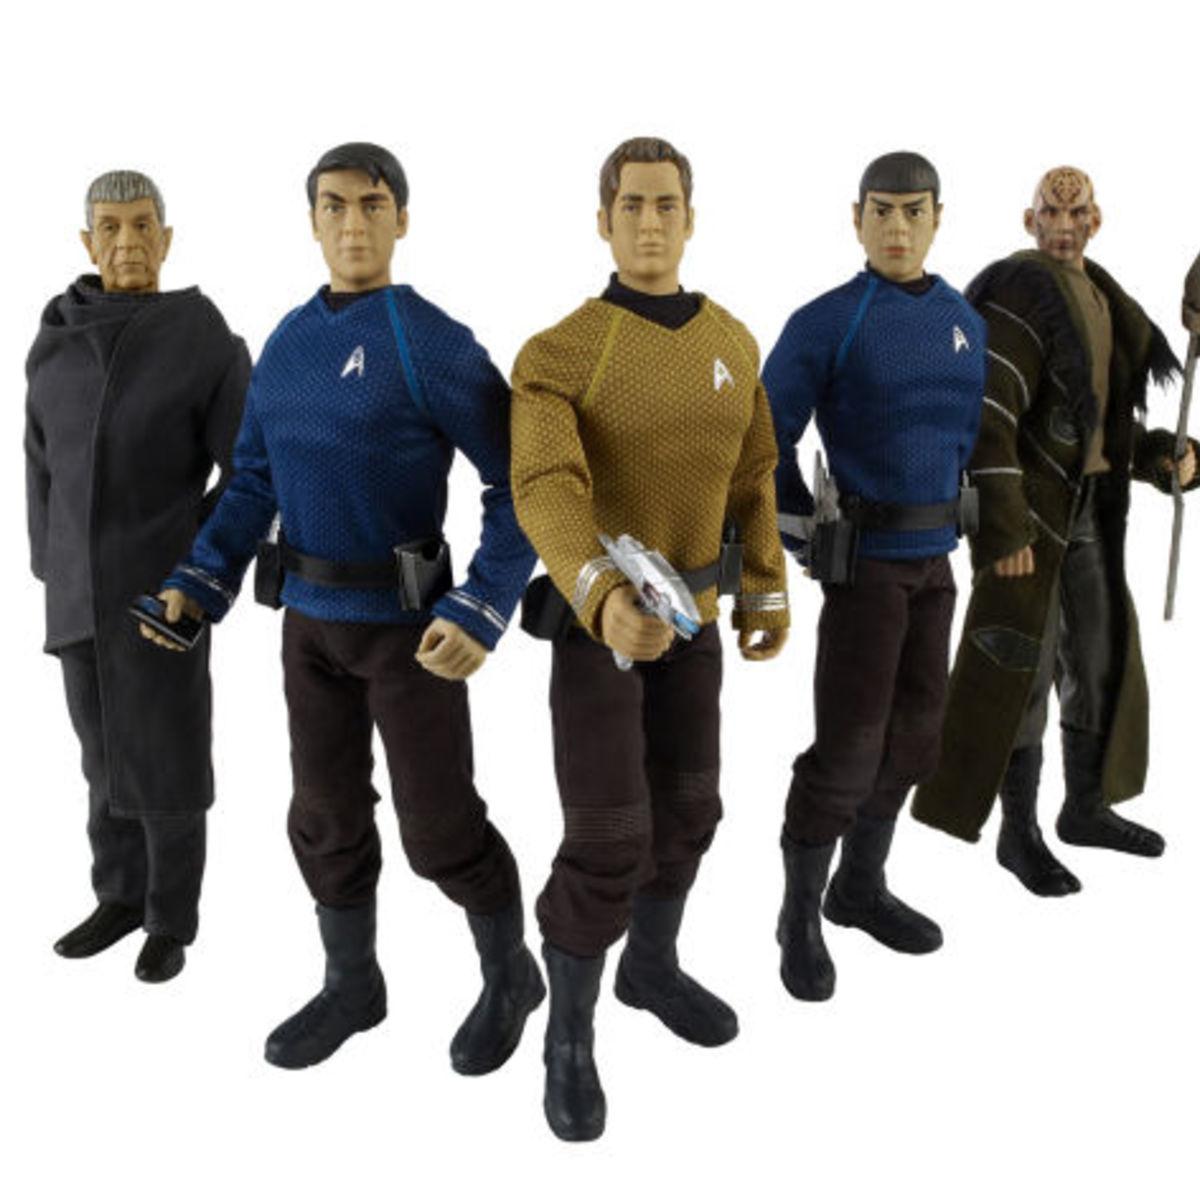 StarTrek_12inch_Star_Trek_5_figs.jpg